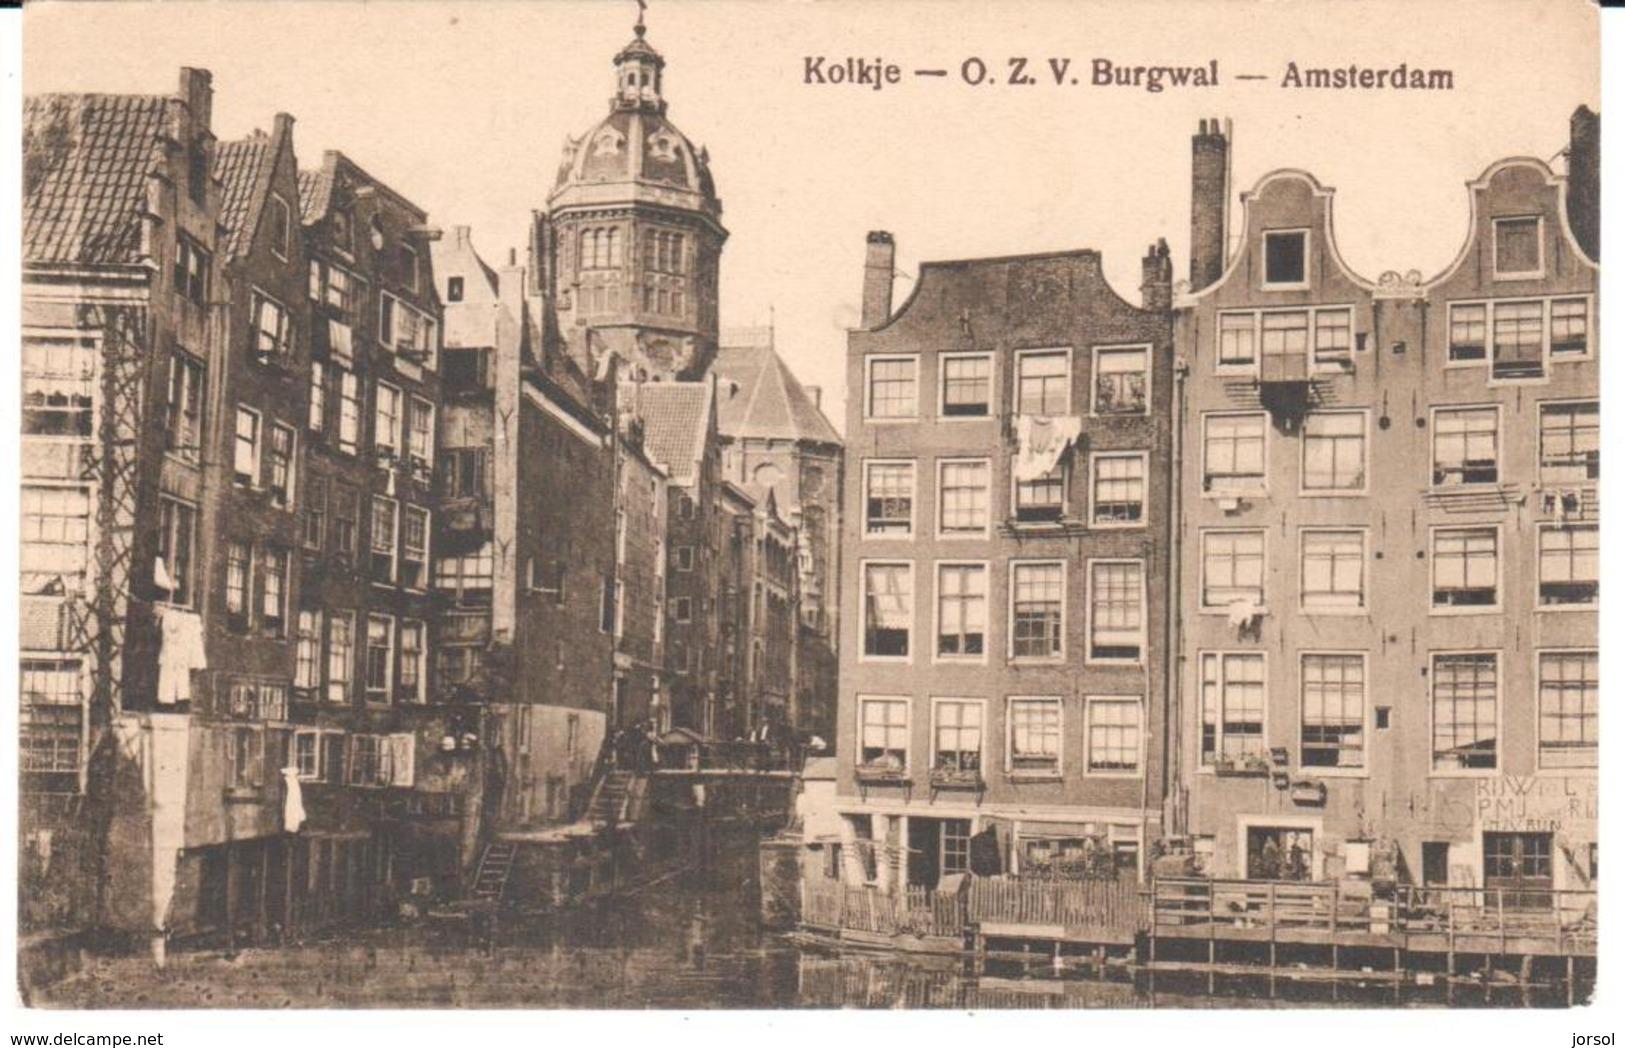 POSTAL   -AMSTERDAN  - PAISES BAJOS  KOLKJE-O.Z.V. BURGWAL-( VISTA DEL CANAL DE  KOLKJE Y  EL AYUNTAMIENTO) - Amsterdam